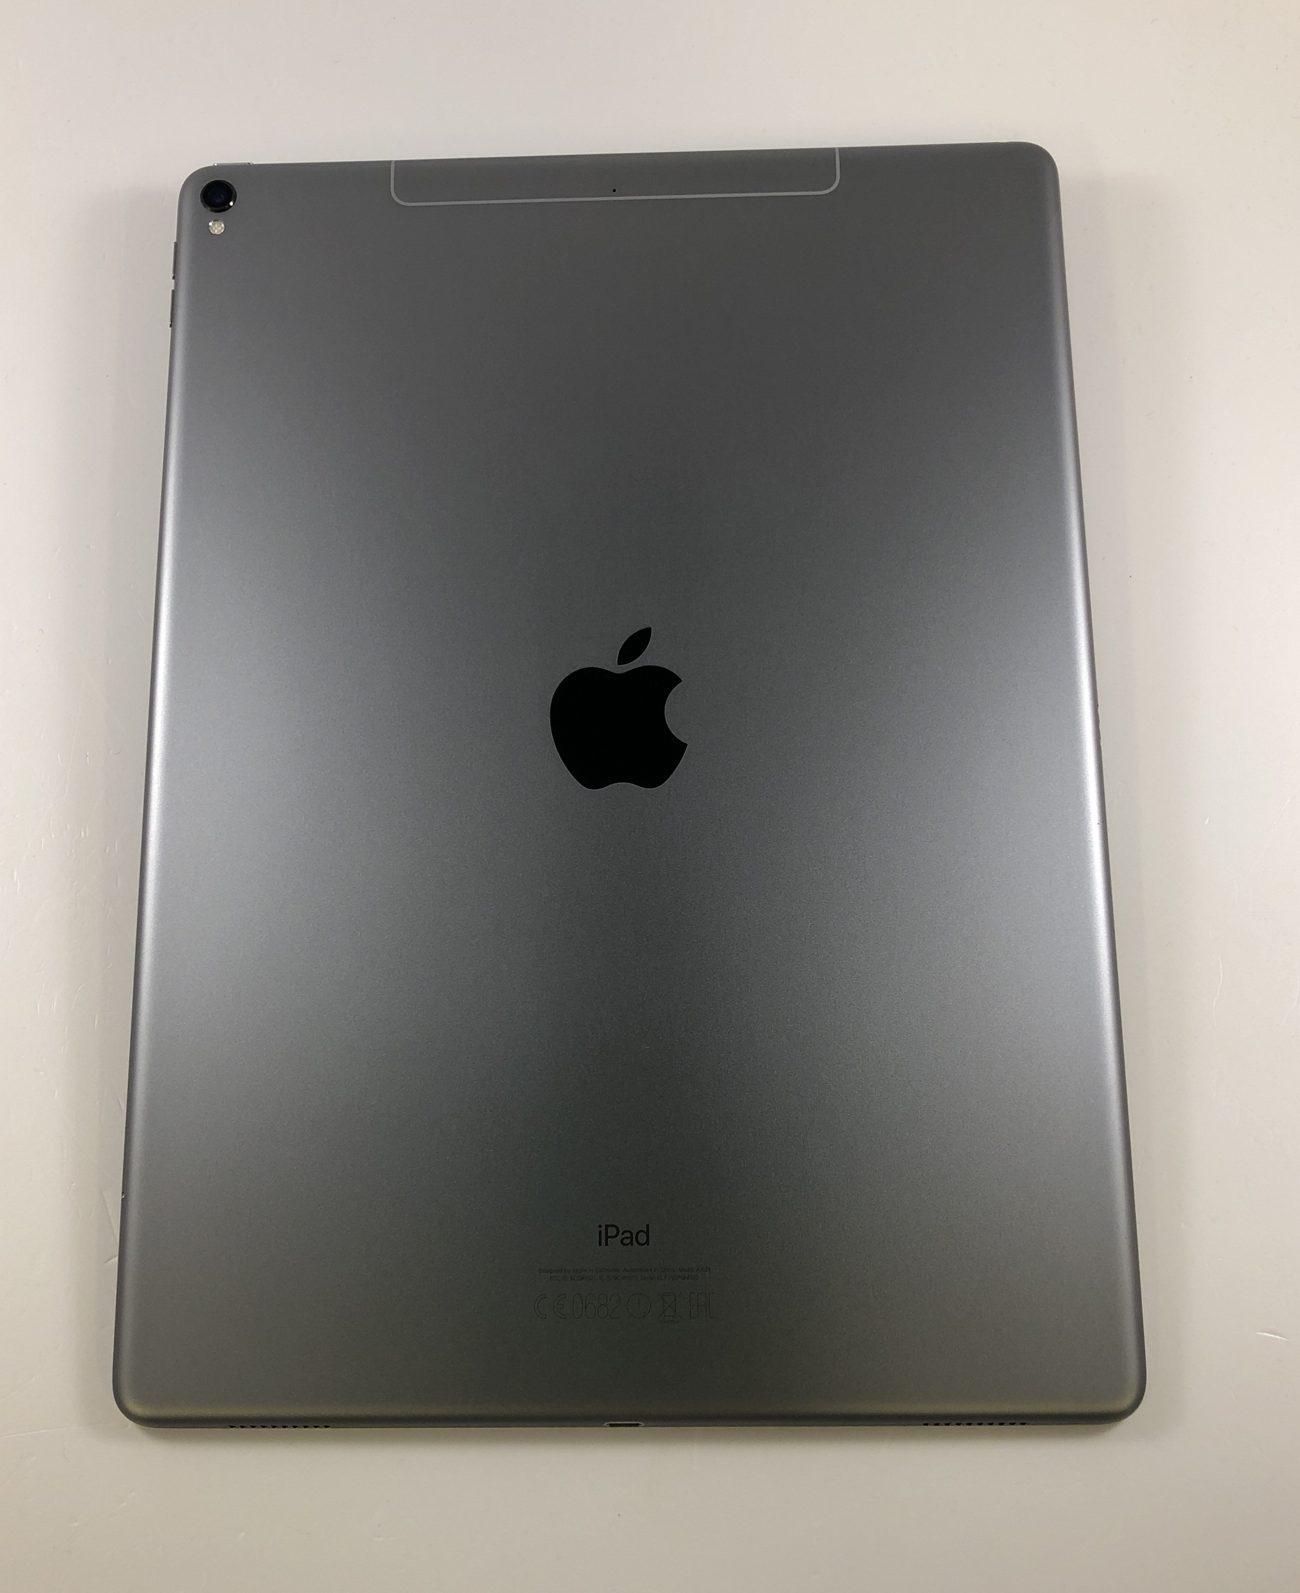 "iPad Pro 12.9"" Wi-Fi + Cellular (2nd Gen) 512GB, 512GB, Space Gray, image 2"